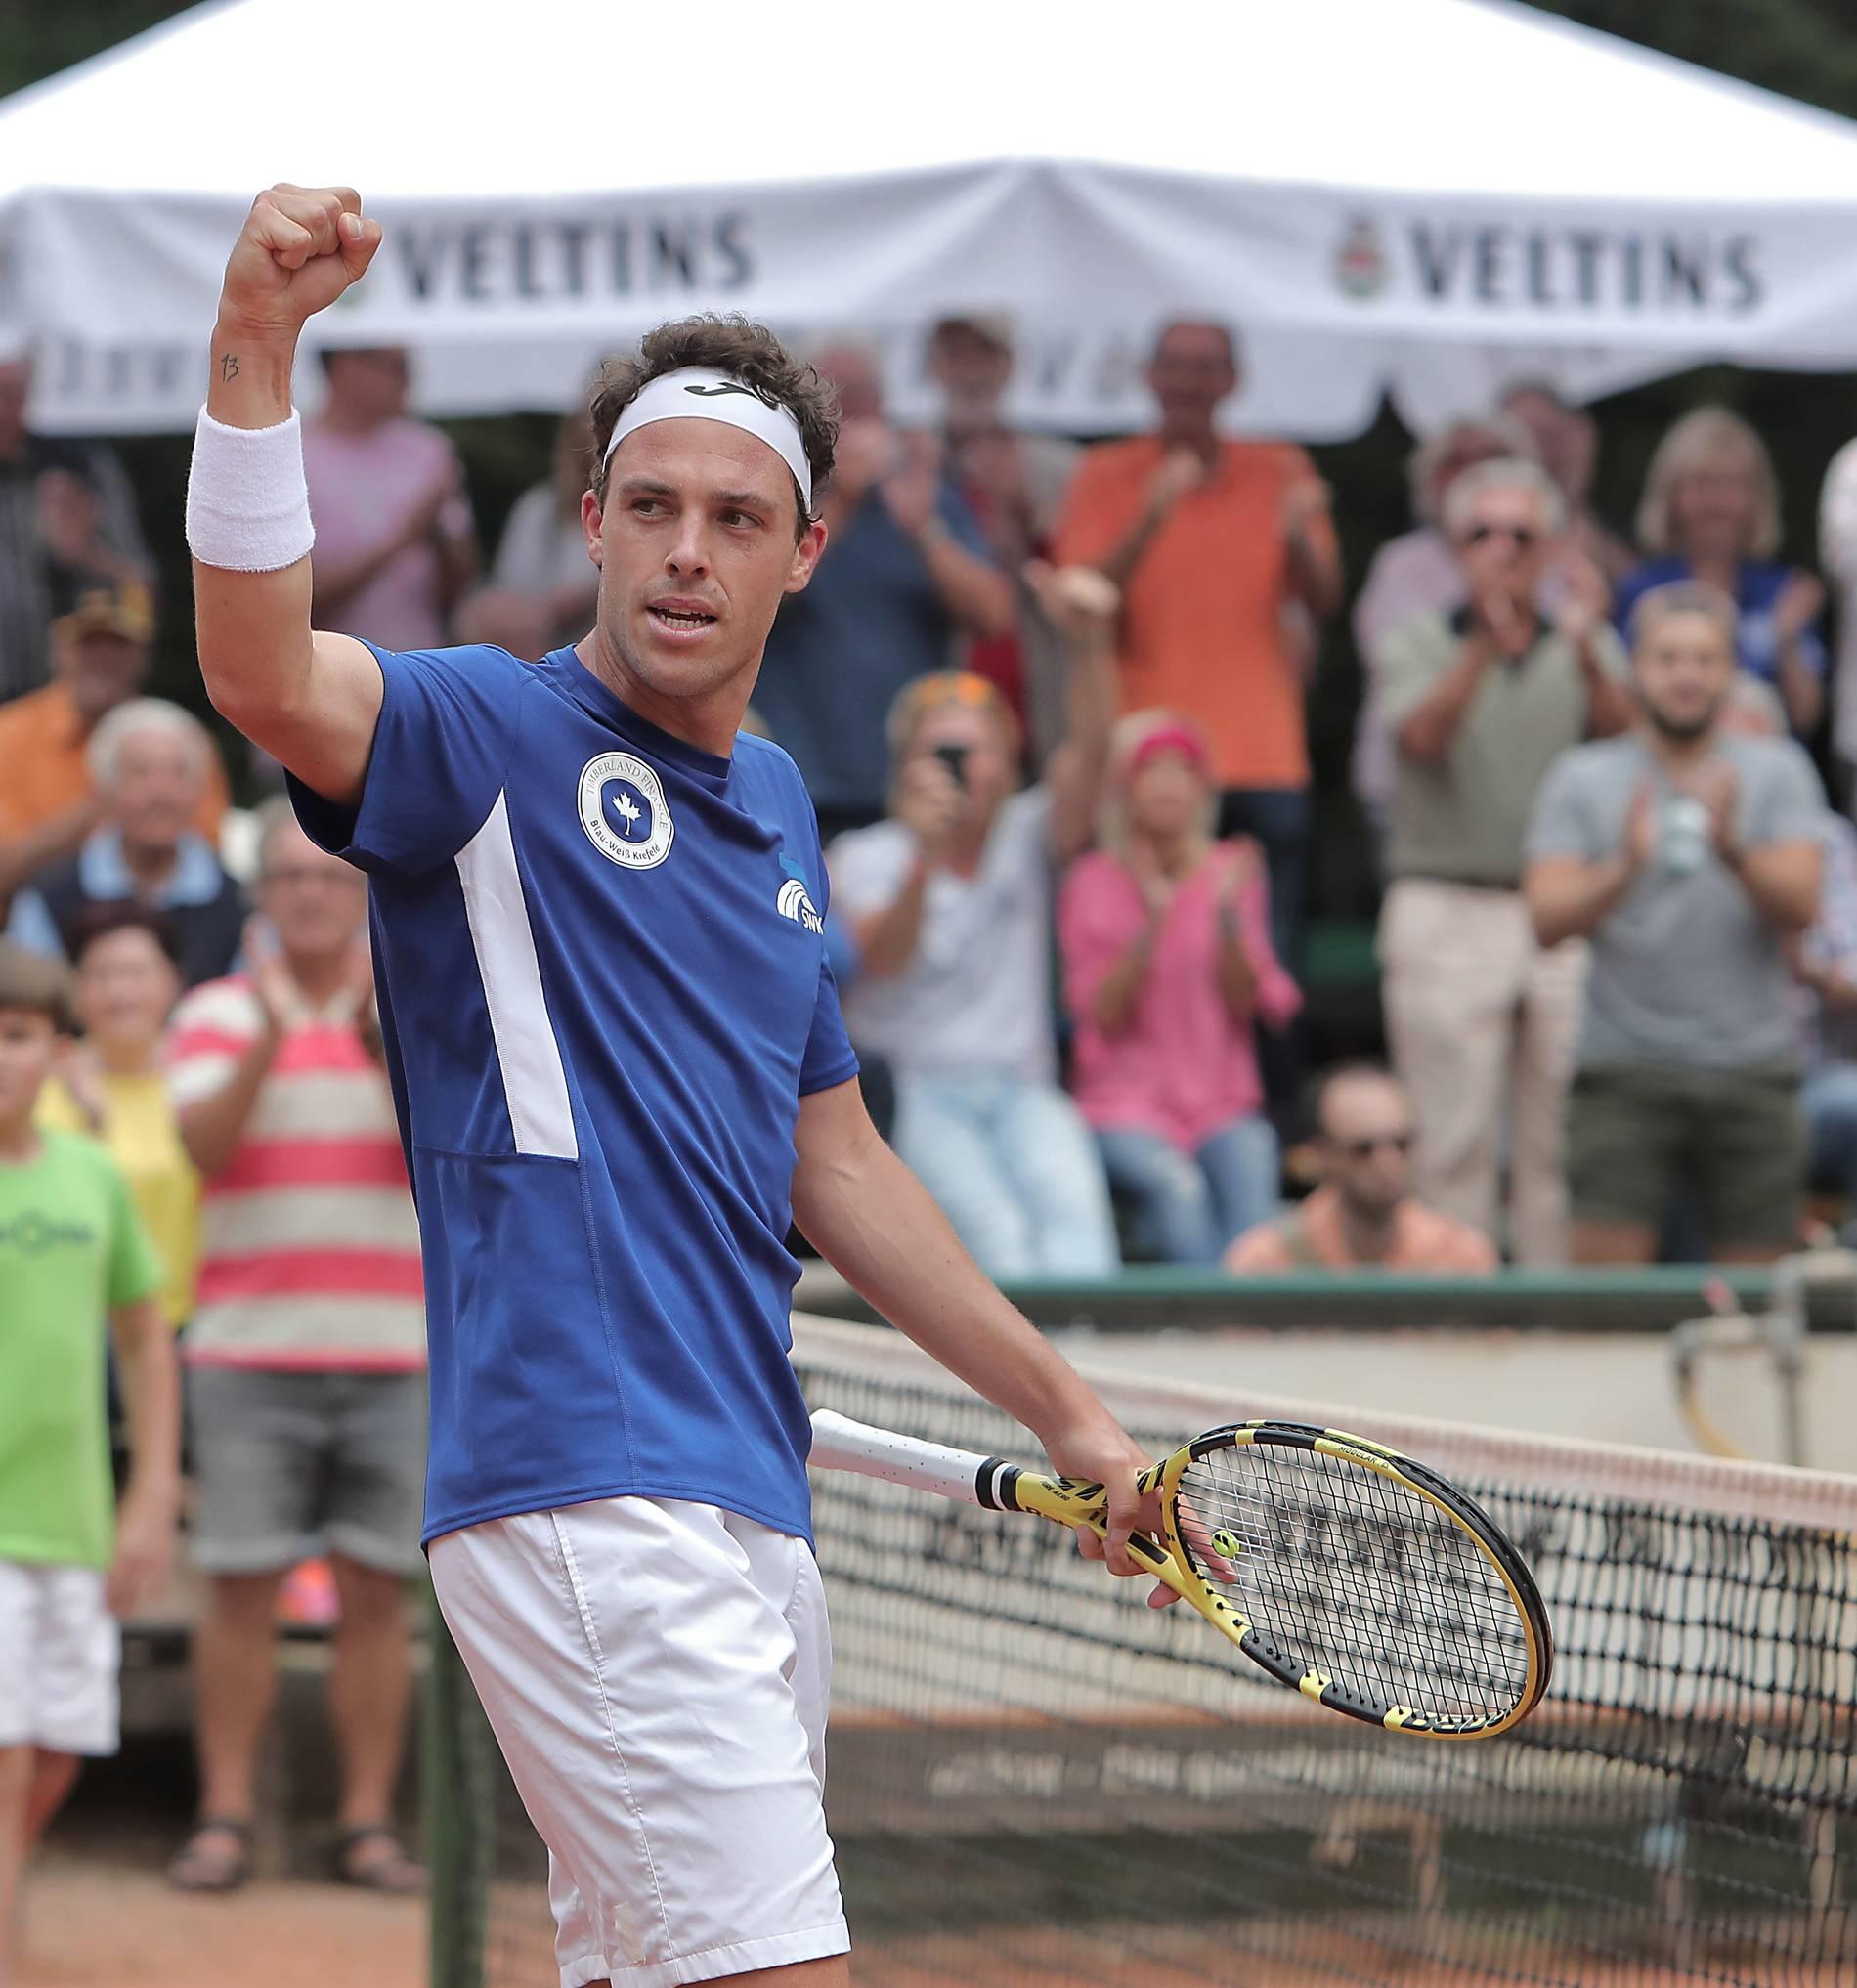 Tennis Blau Weiß